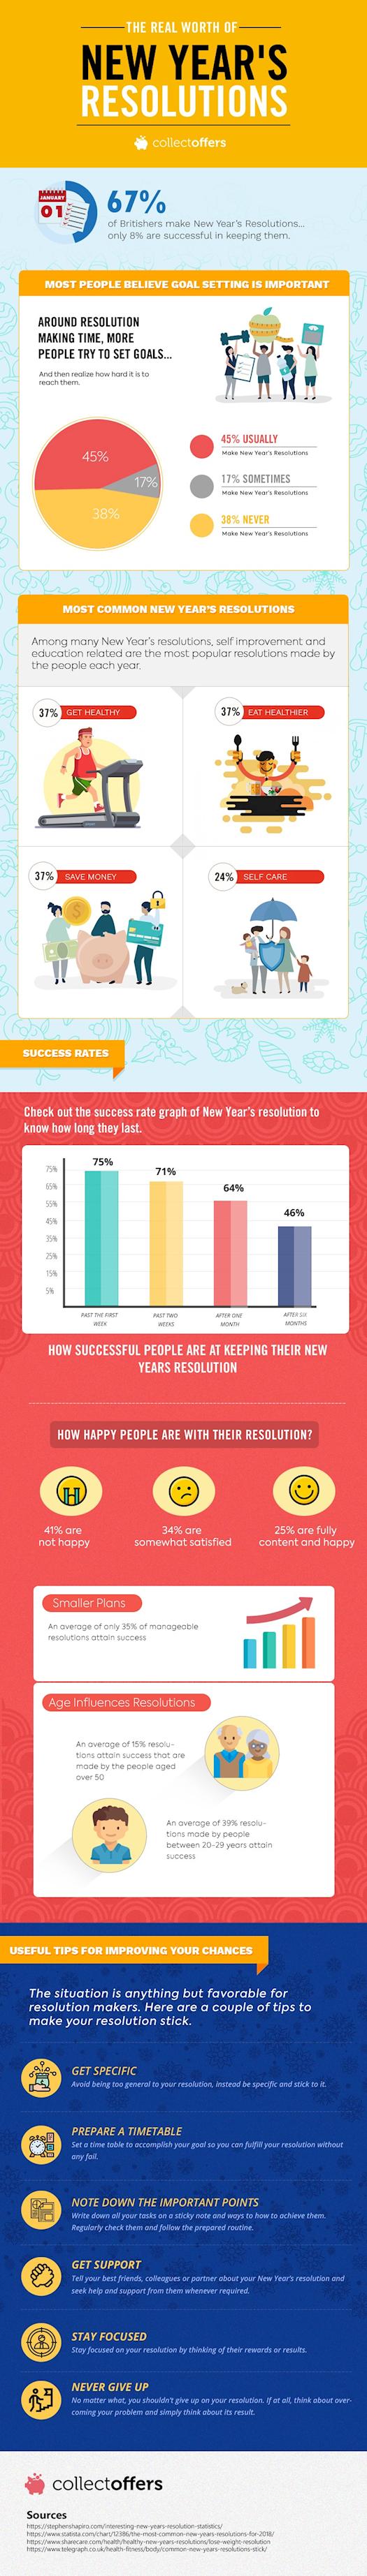 New Year Resolution 2019.